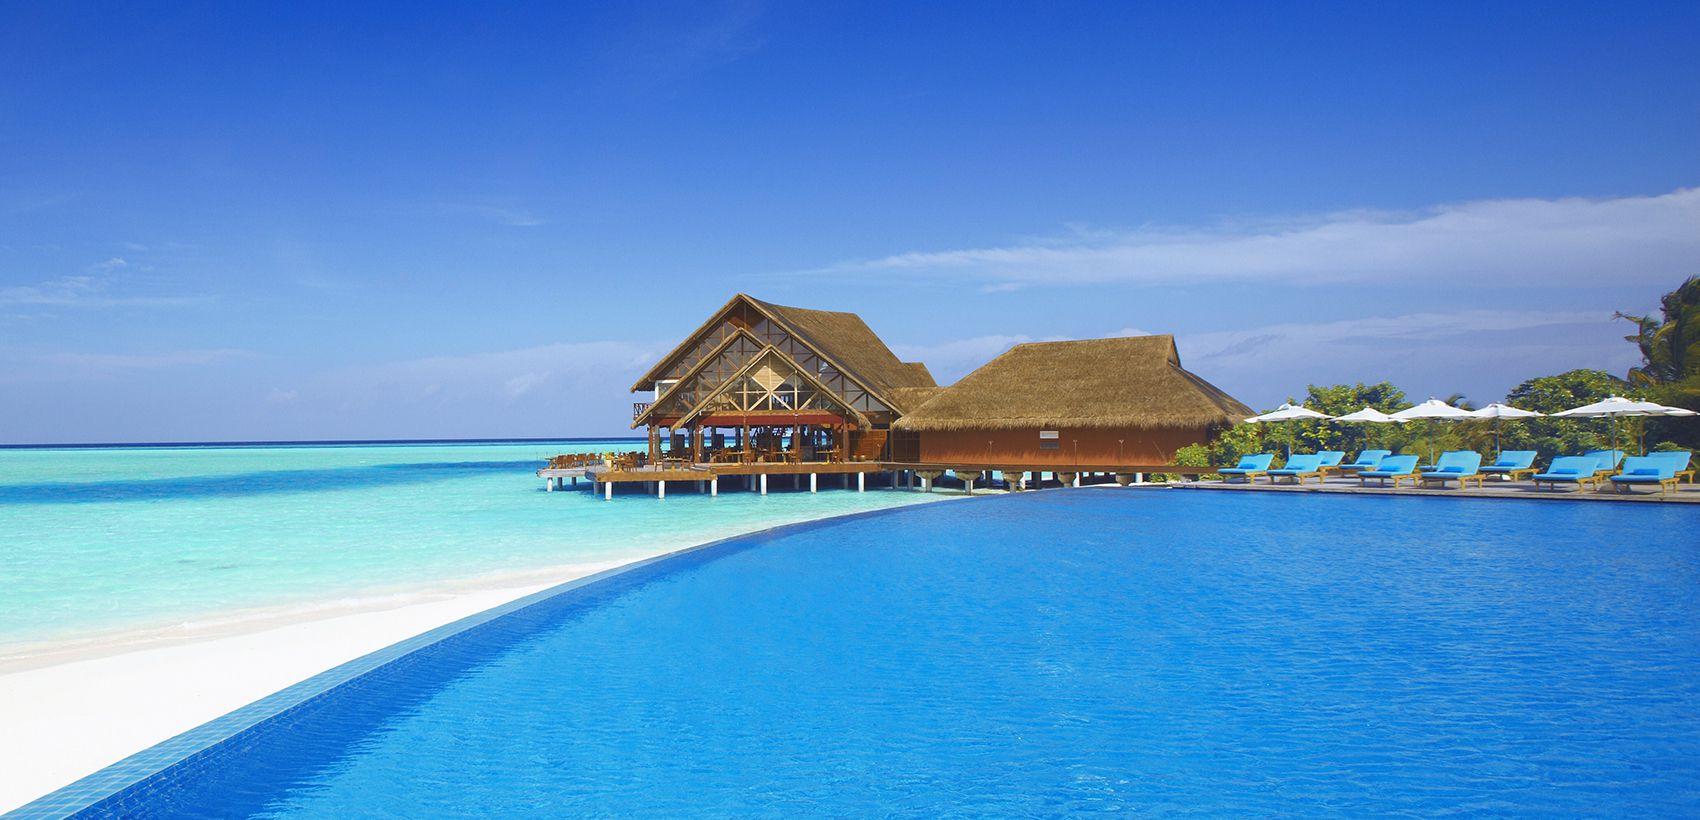 Lisboa » Maldivas - Hotéis Anantara: 15.11 a 19.12